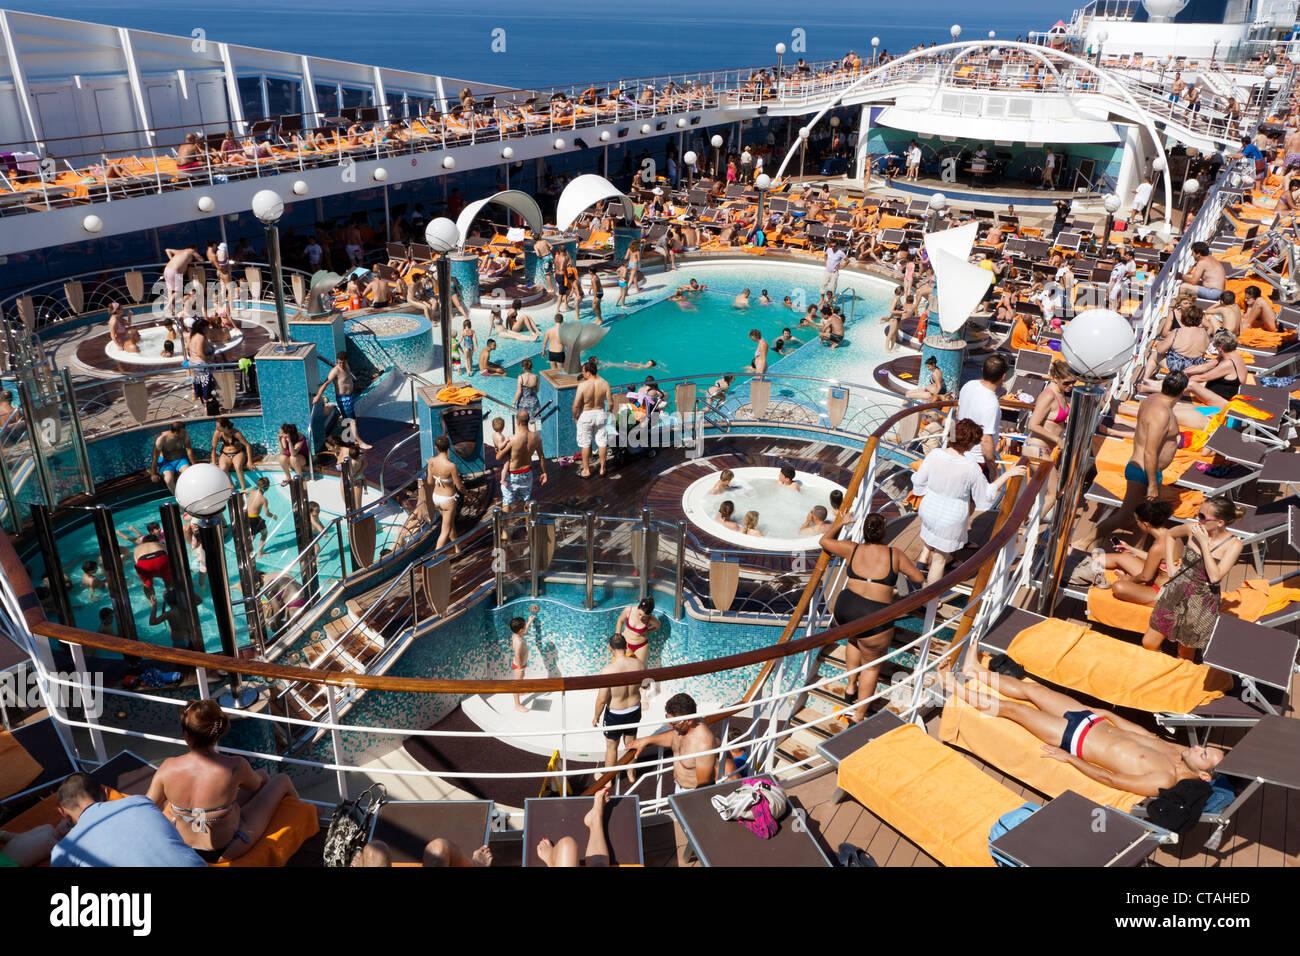 Swimming Pool Areas On Italian Cruise Ship Msc Musica Stock Photo Royalty Free Image 49405733